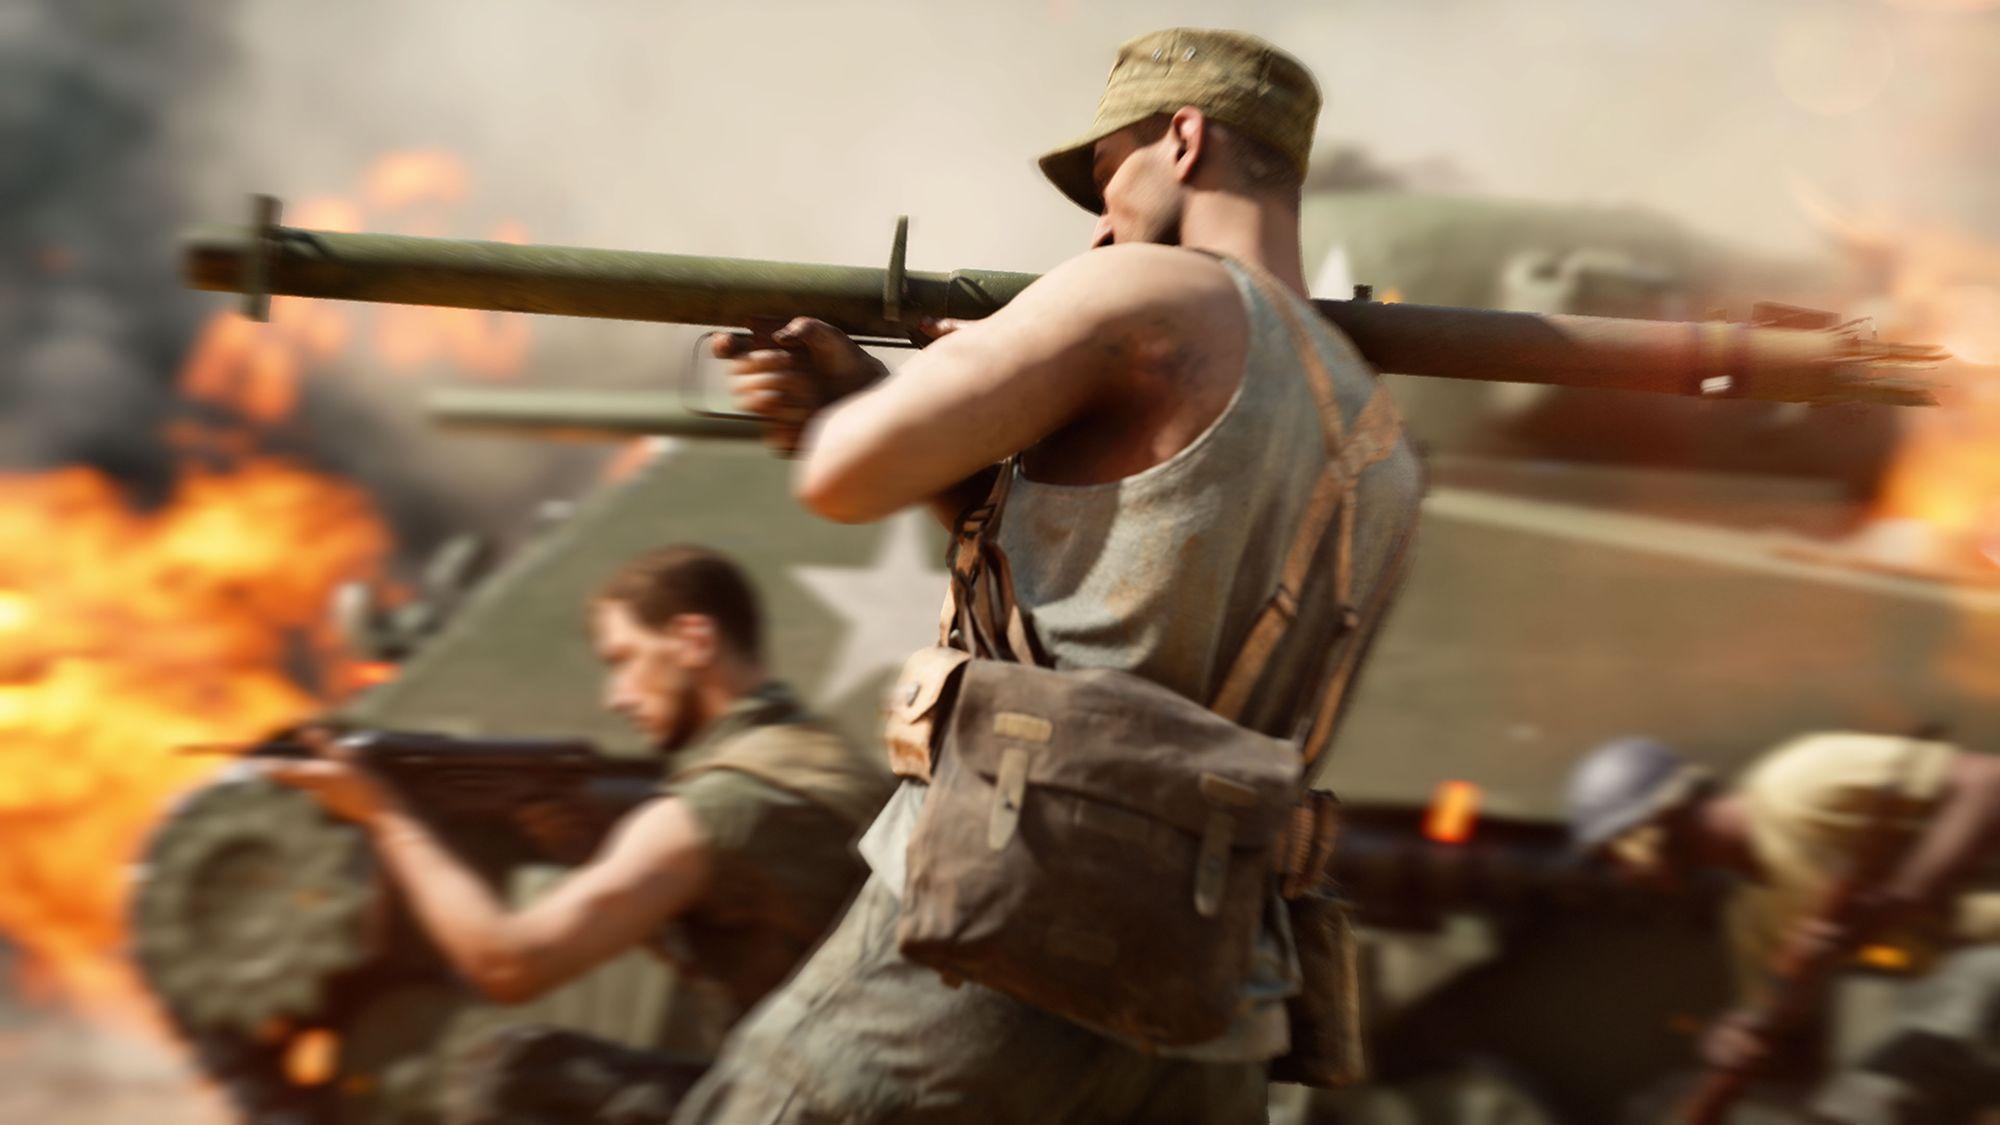 Image: DICE/Electronic Arts